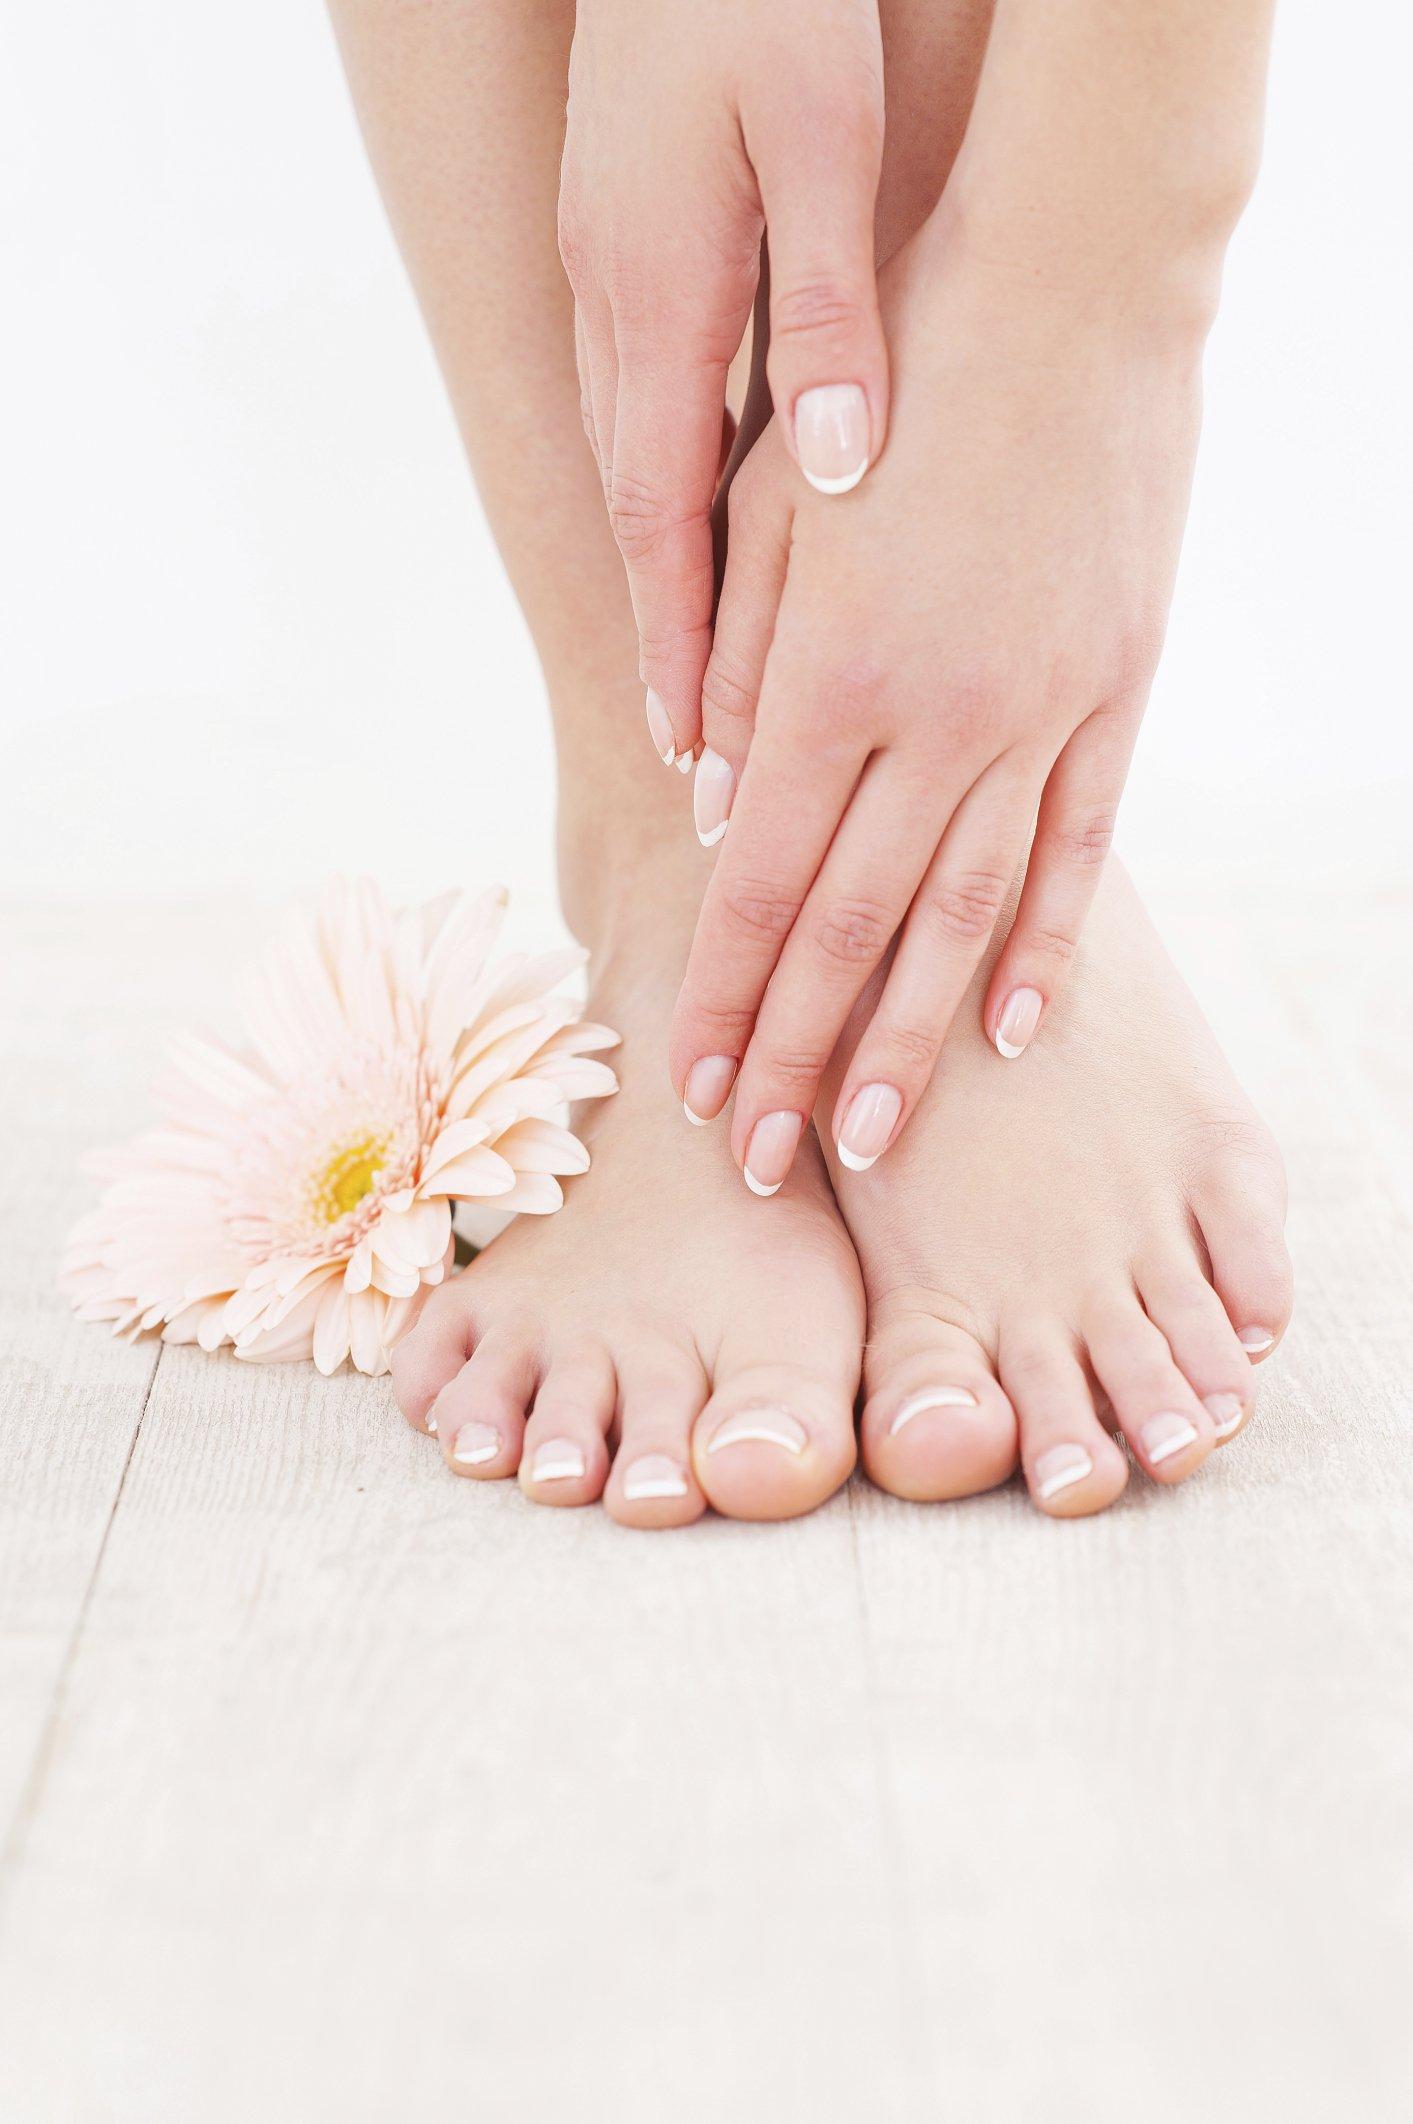 manicure, pedicure, rituali benessere